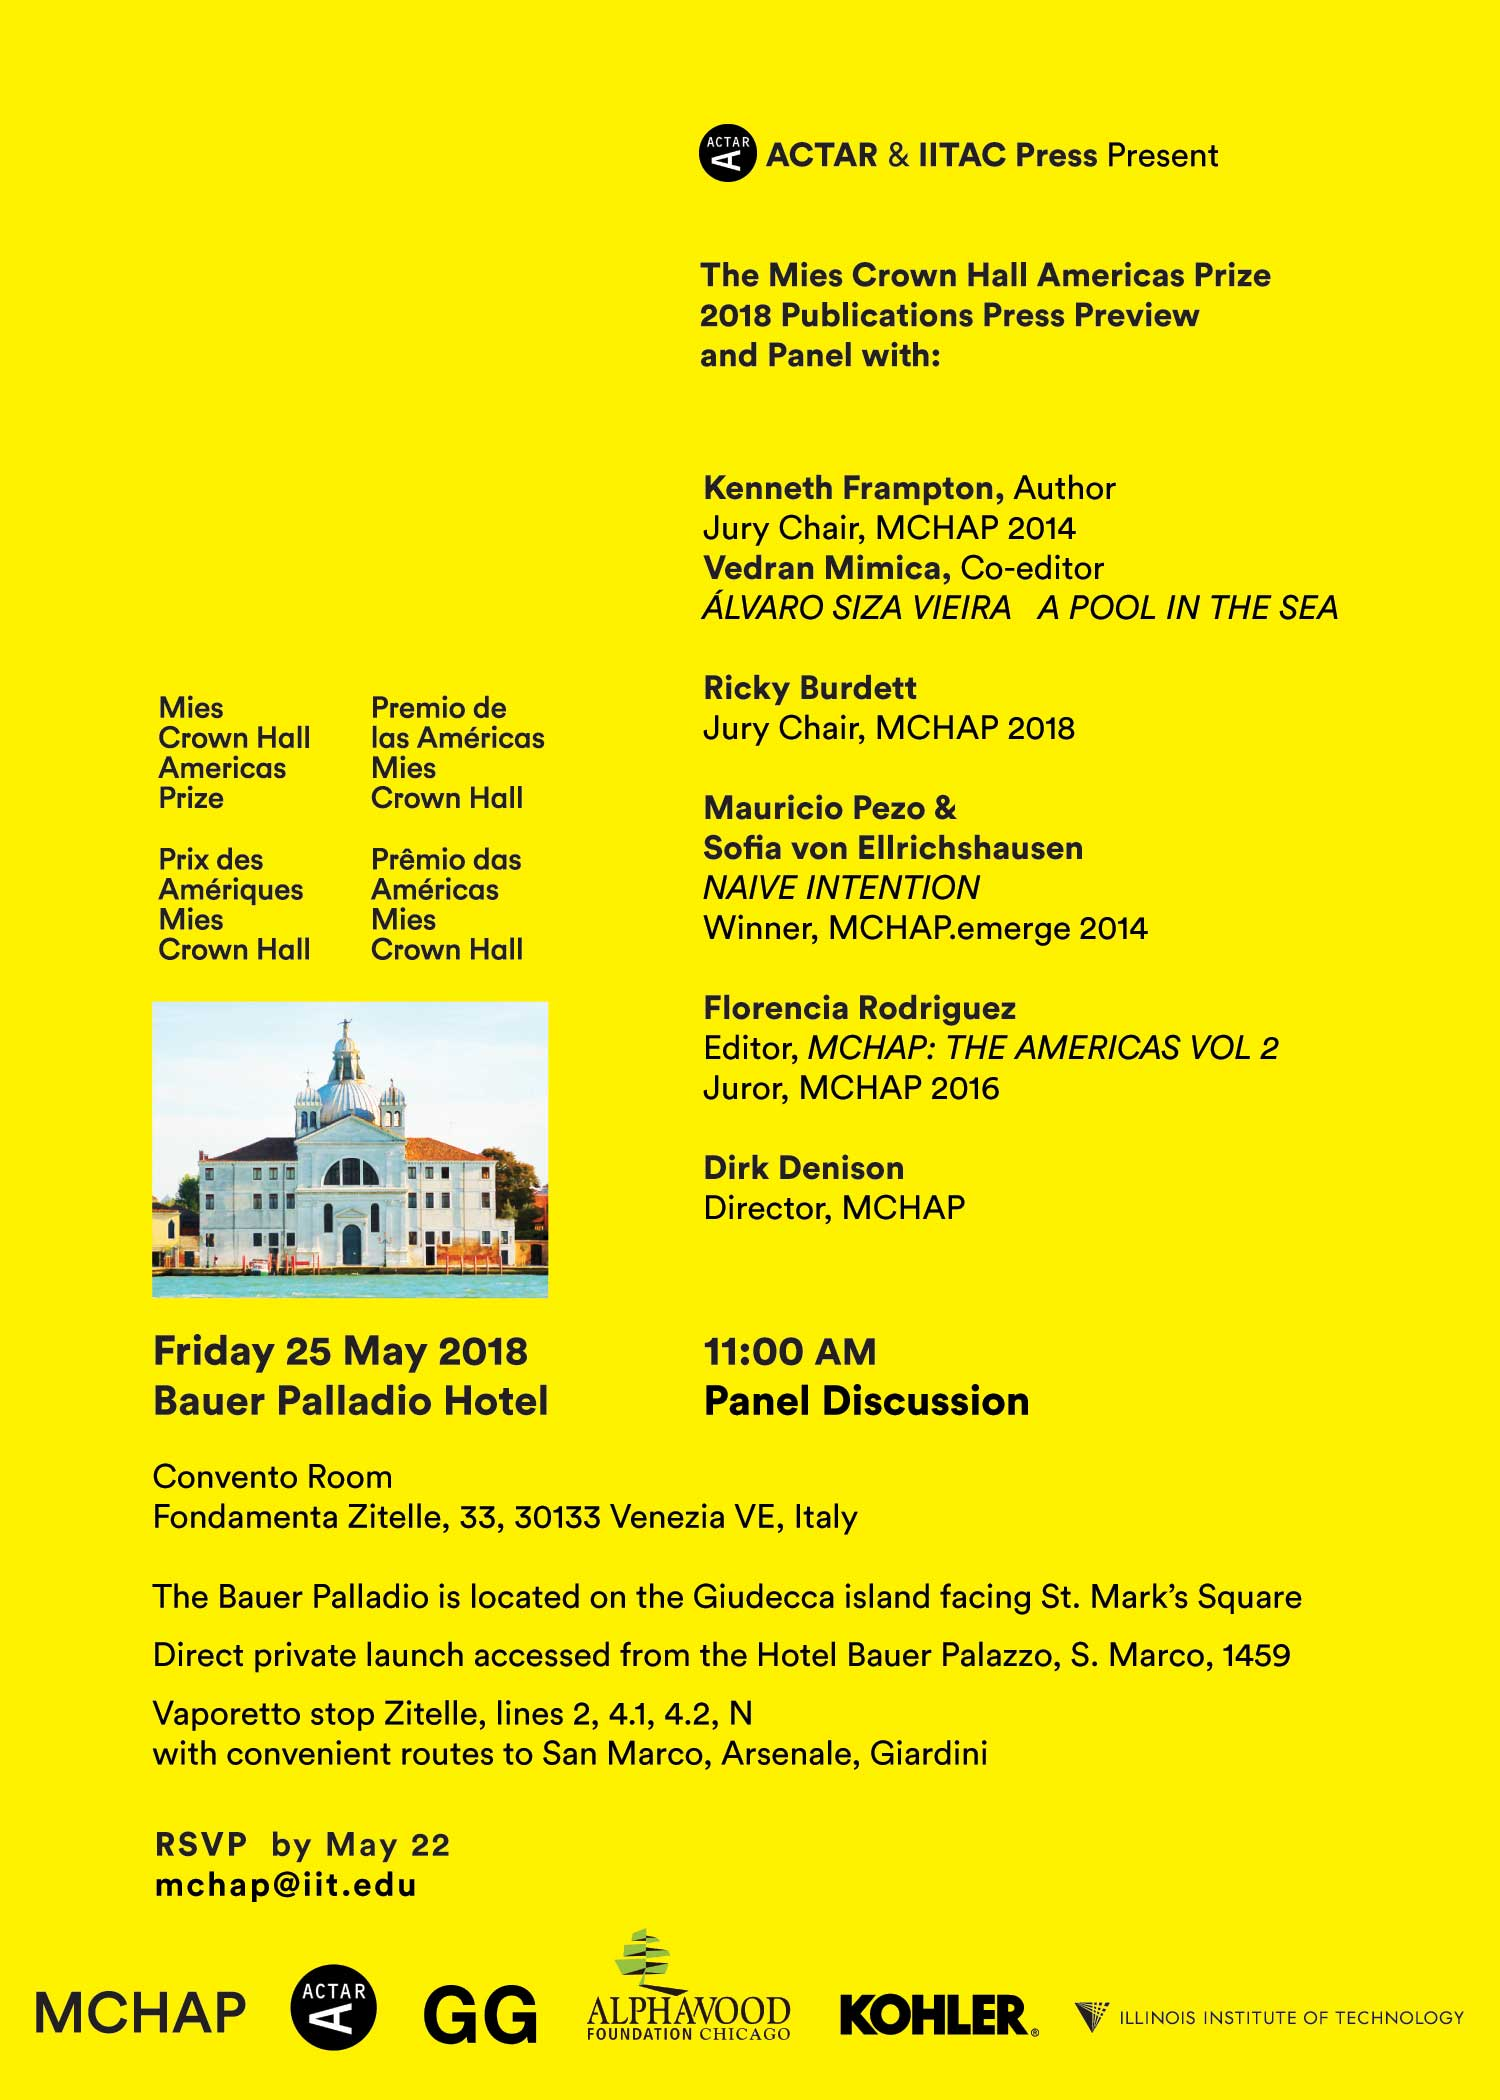 2_Web_New_MCHAP_May25_Panel-_Venice.jpg